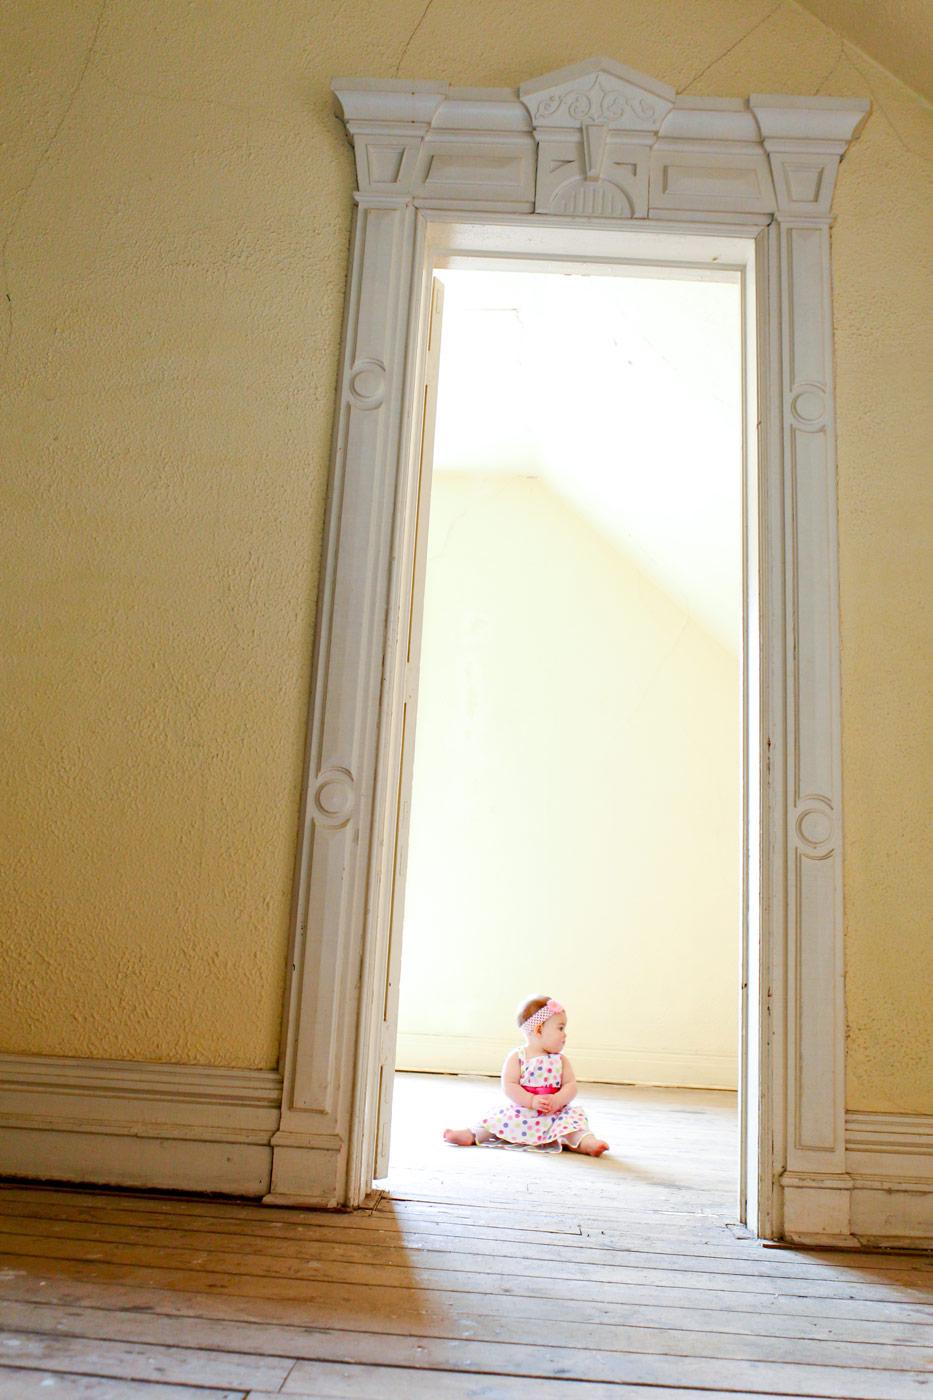 baby-portrait-ruthie-hauge-photography-st-charles-geneva-batavia.jpg